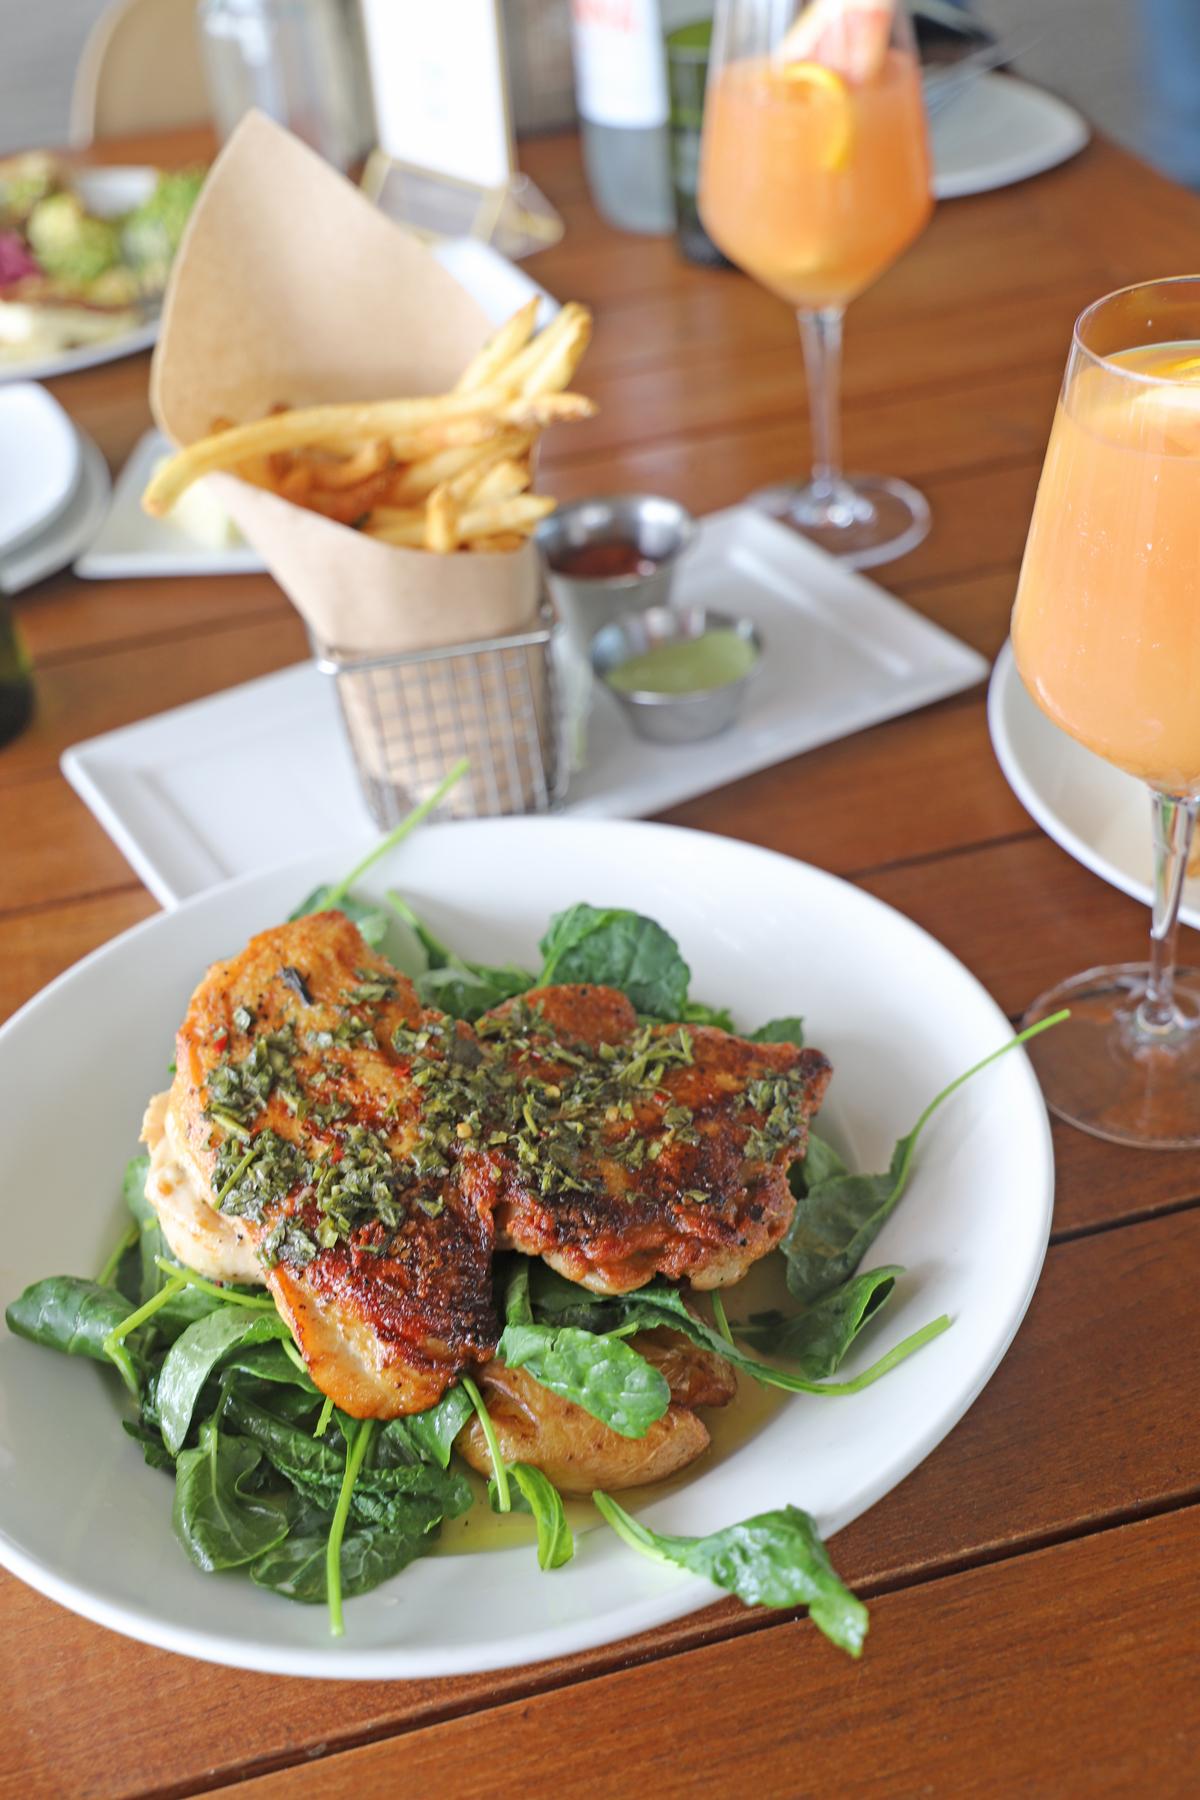 Best Brunch Spot Miami by the water - Verde at PAMM crispy chicken